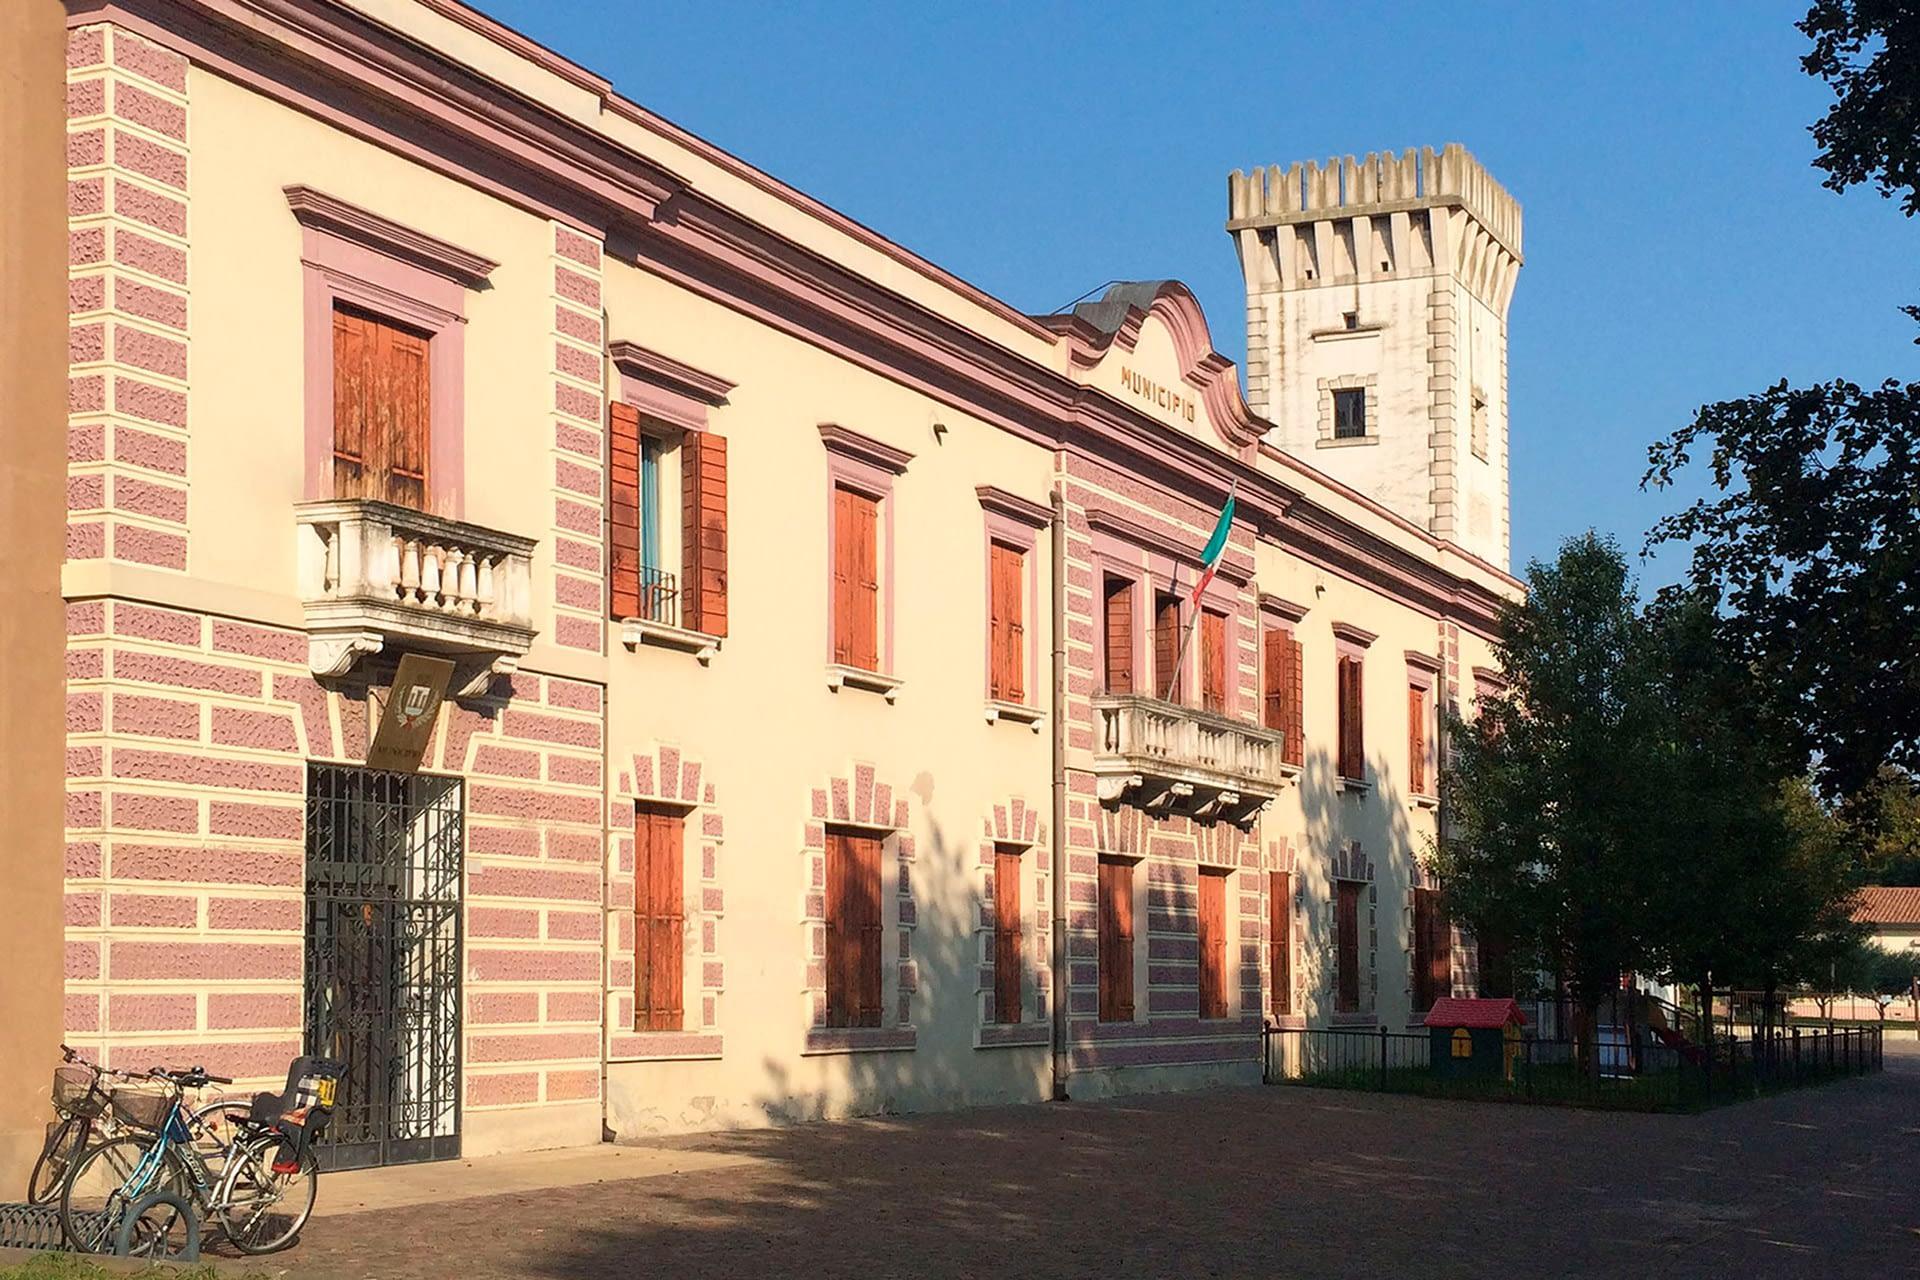 Tribano_Municipio e torre civica